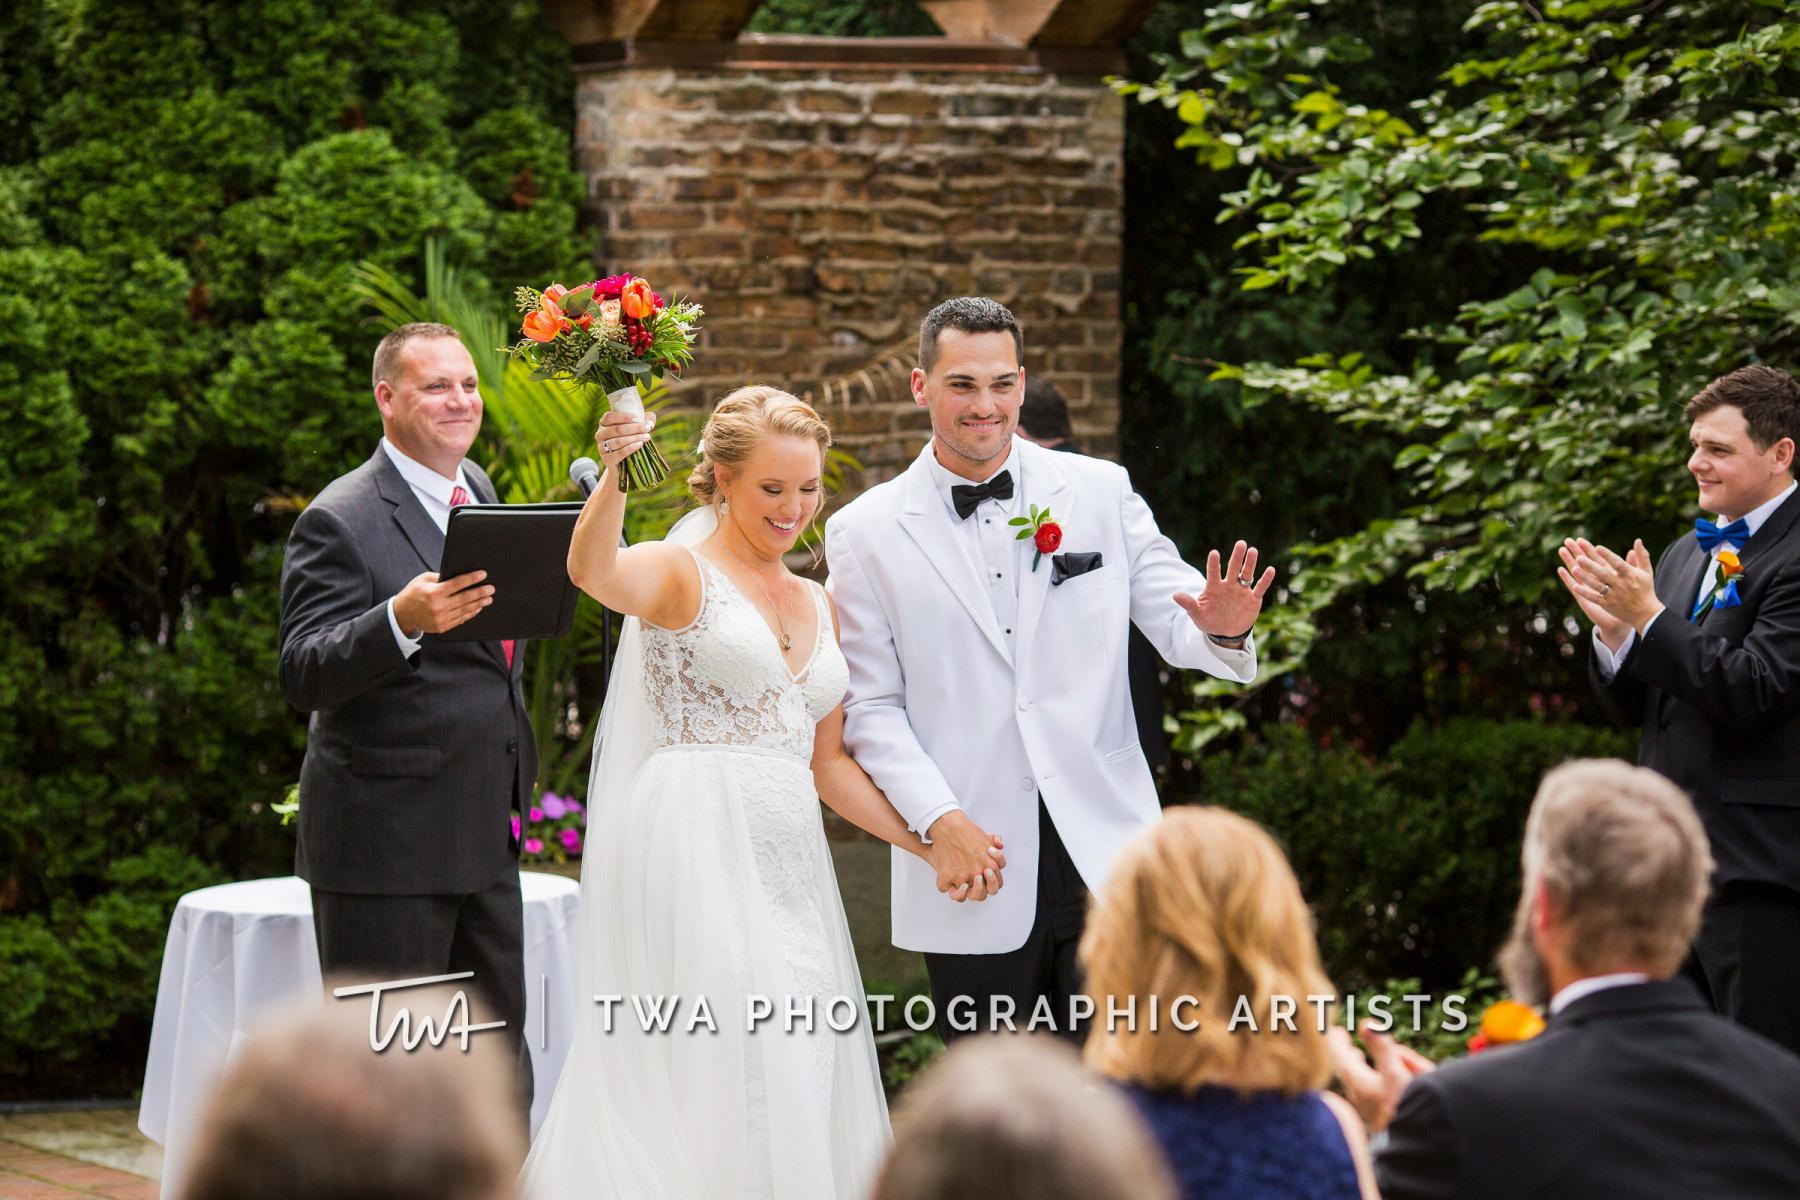 Chicago-Wedding-Photographers-Renaissance-Hotel_Hohensee_Fleishman_JG_DK-032-1173